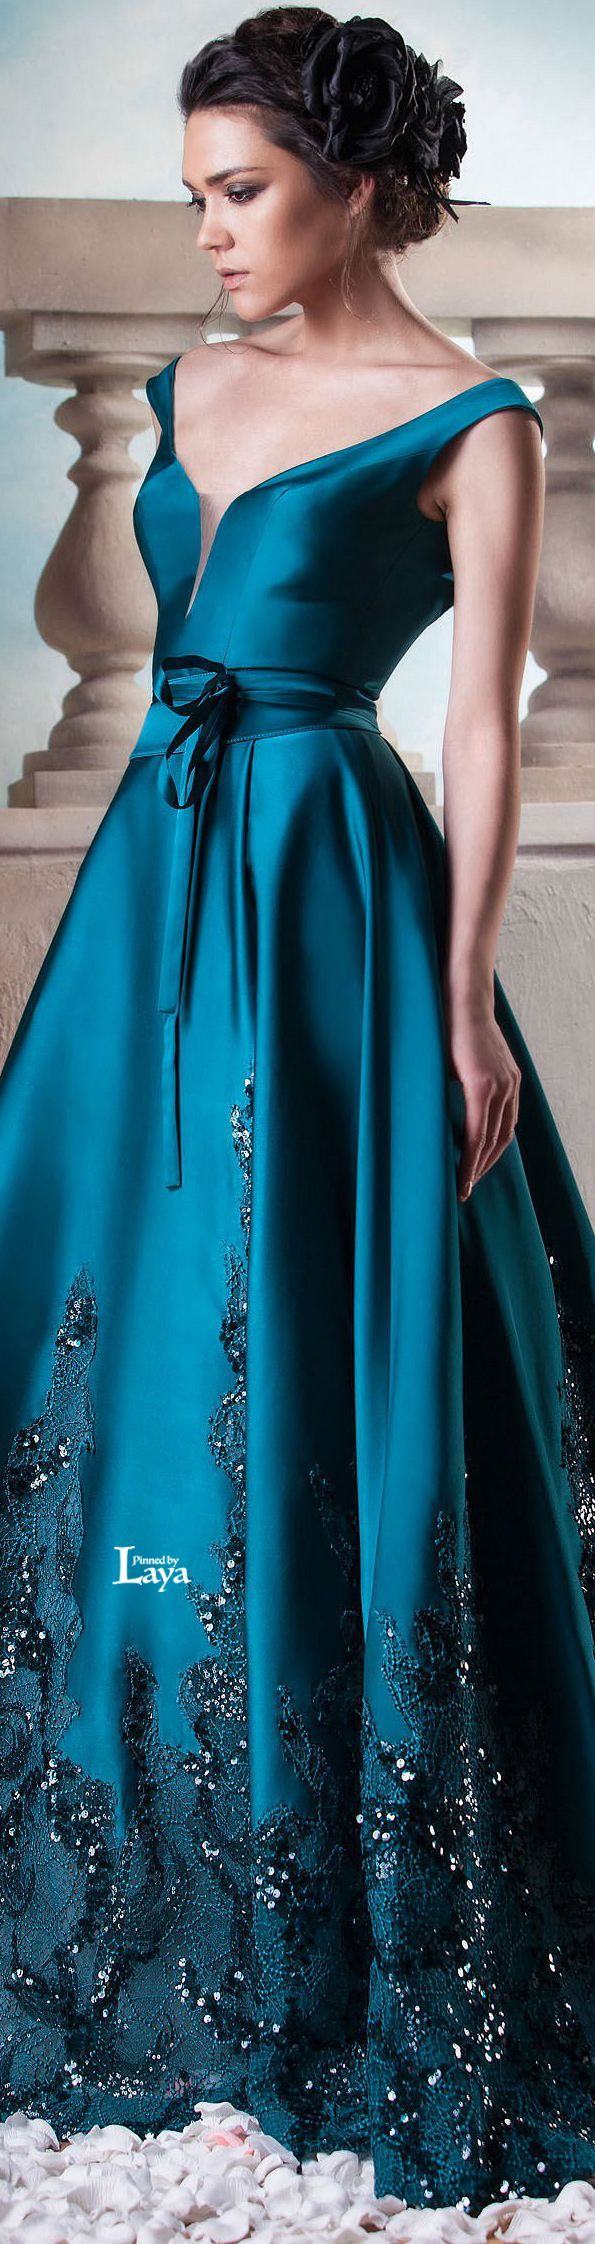 Hanna Touma ~  Couture Summer Teal Satin Flared Skirt Gown 2015